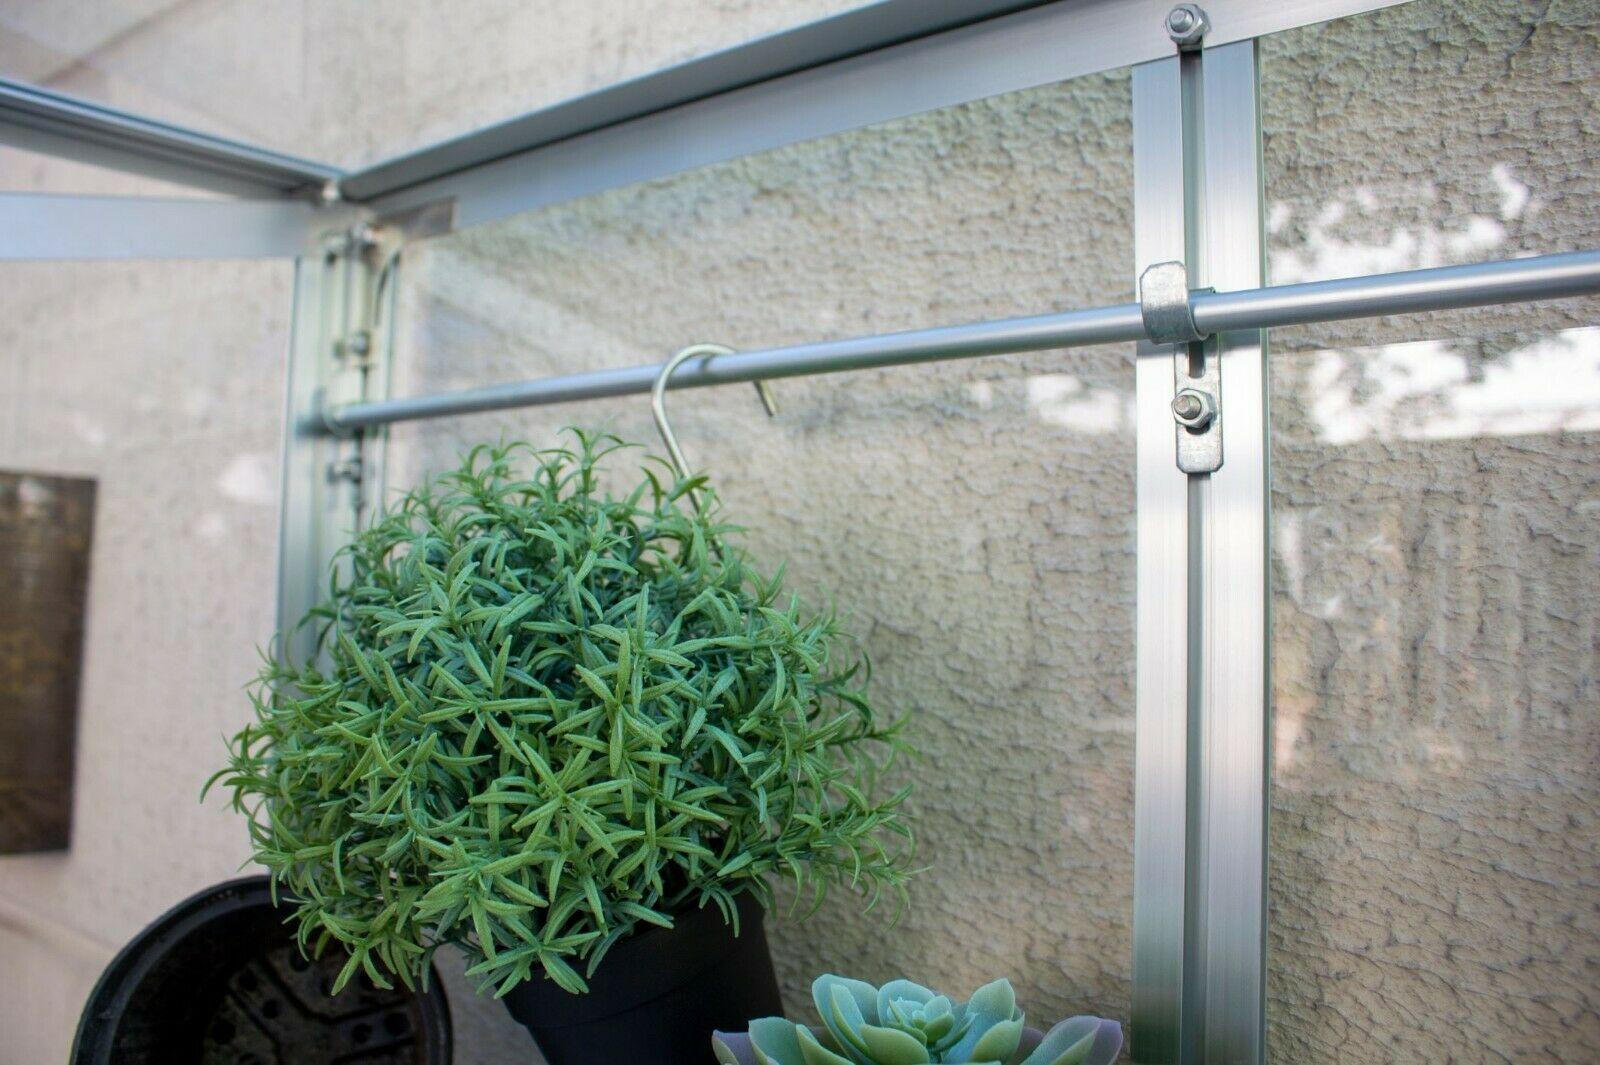 Vitavia Polis Balkongewächshaus 350 ESG - Balkon Gewächshaus